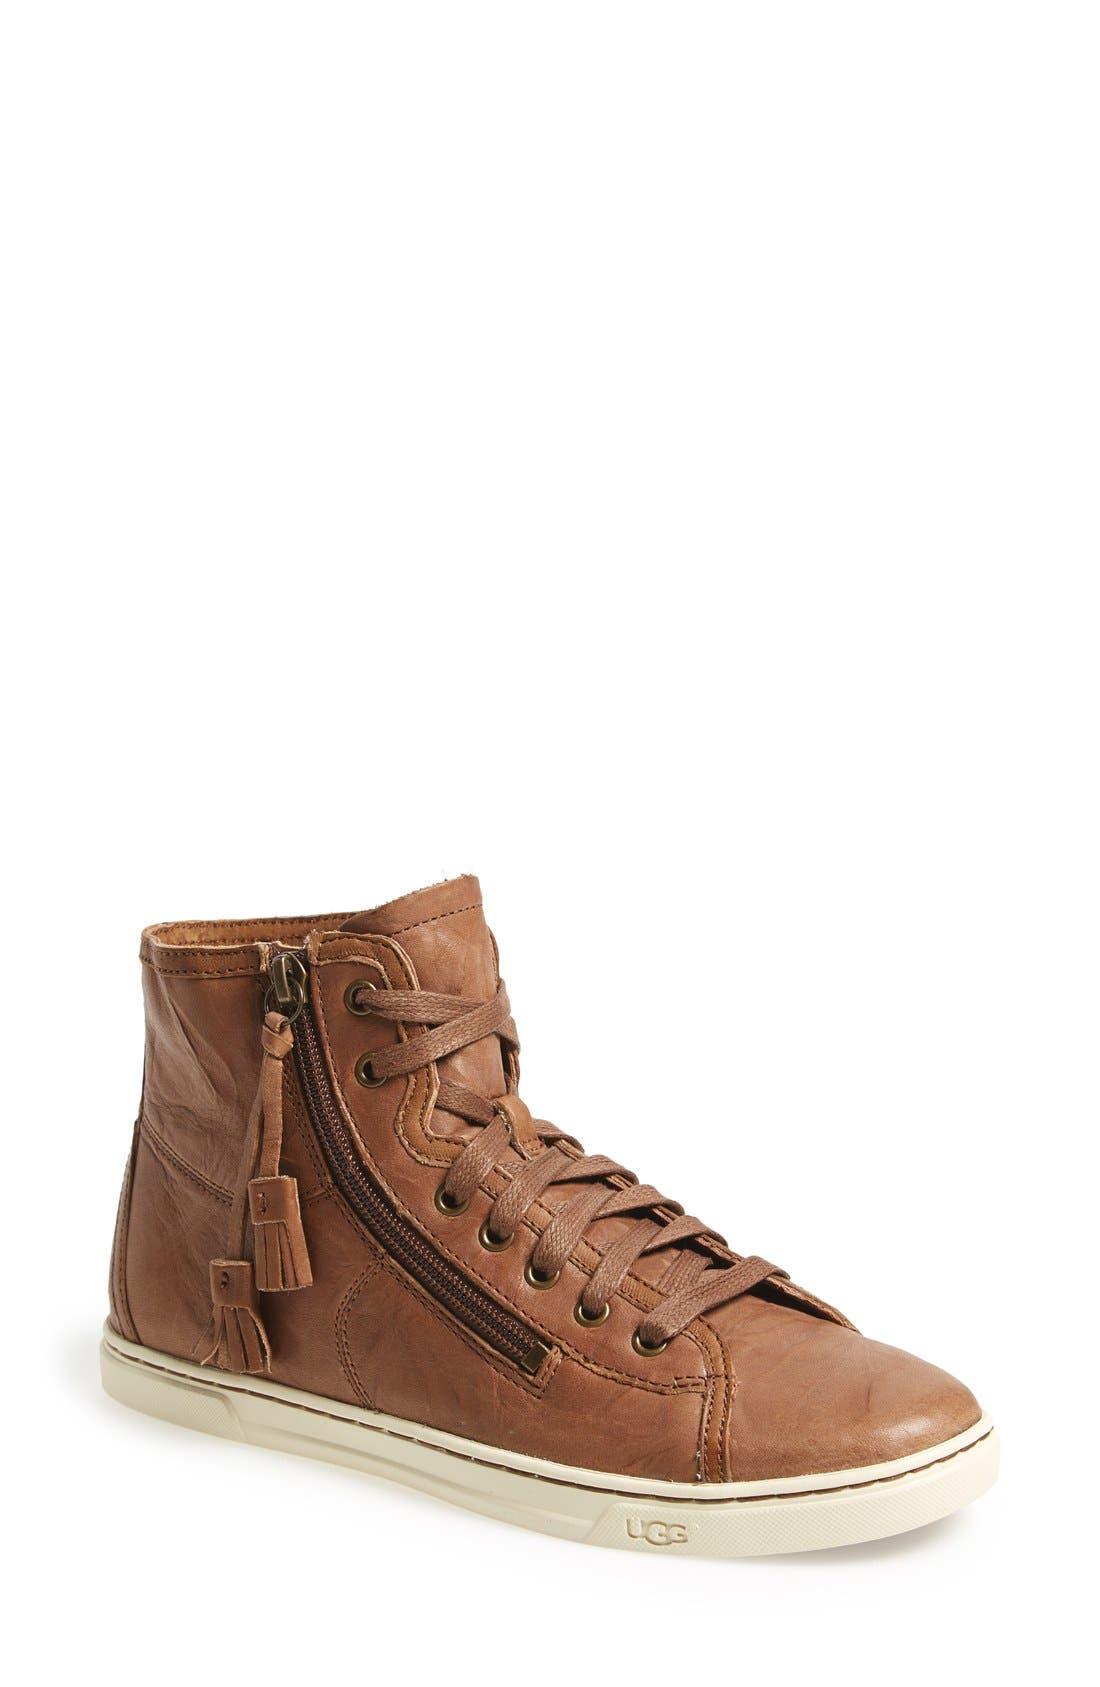 Alternate Image 1 Selected - UGG® 'Blaney' Tasseled High Top Sneaker (Women)